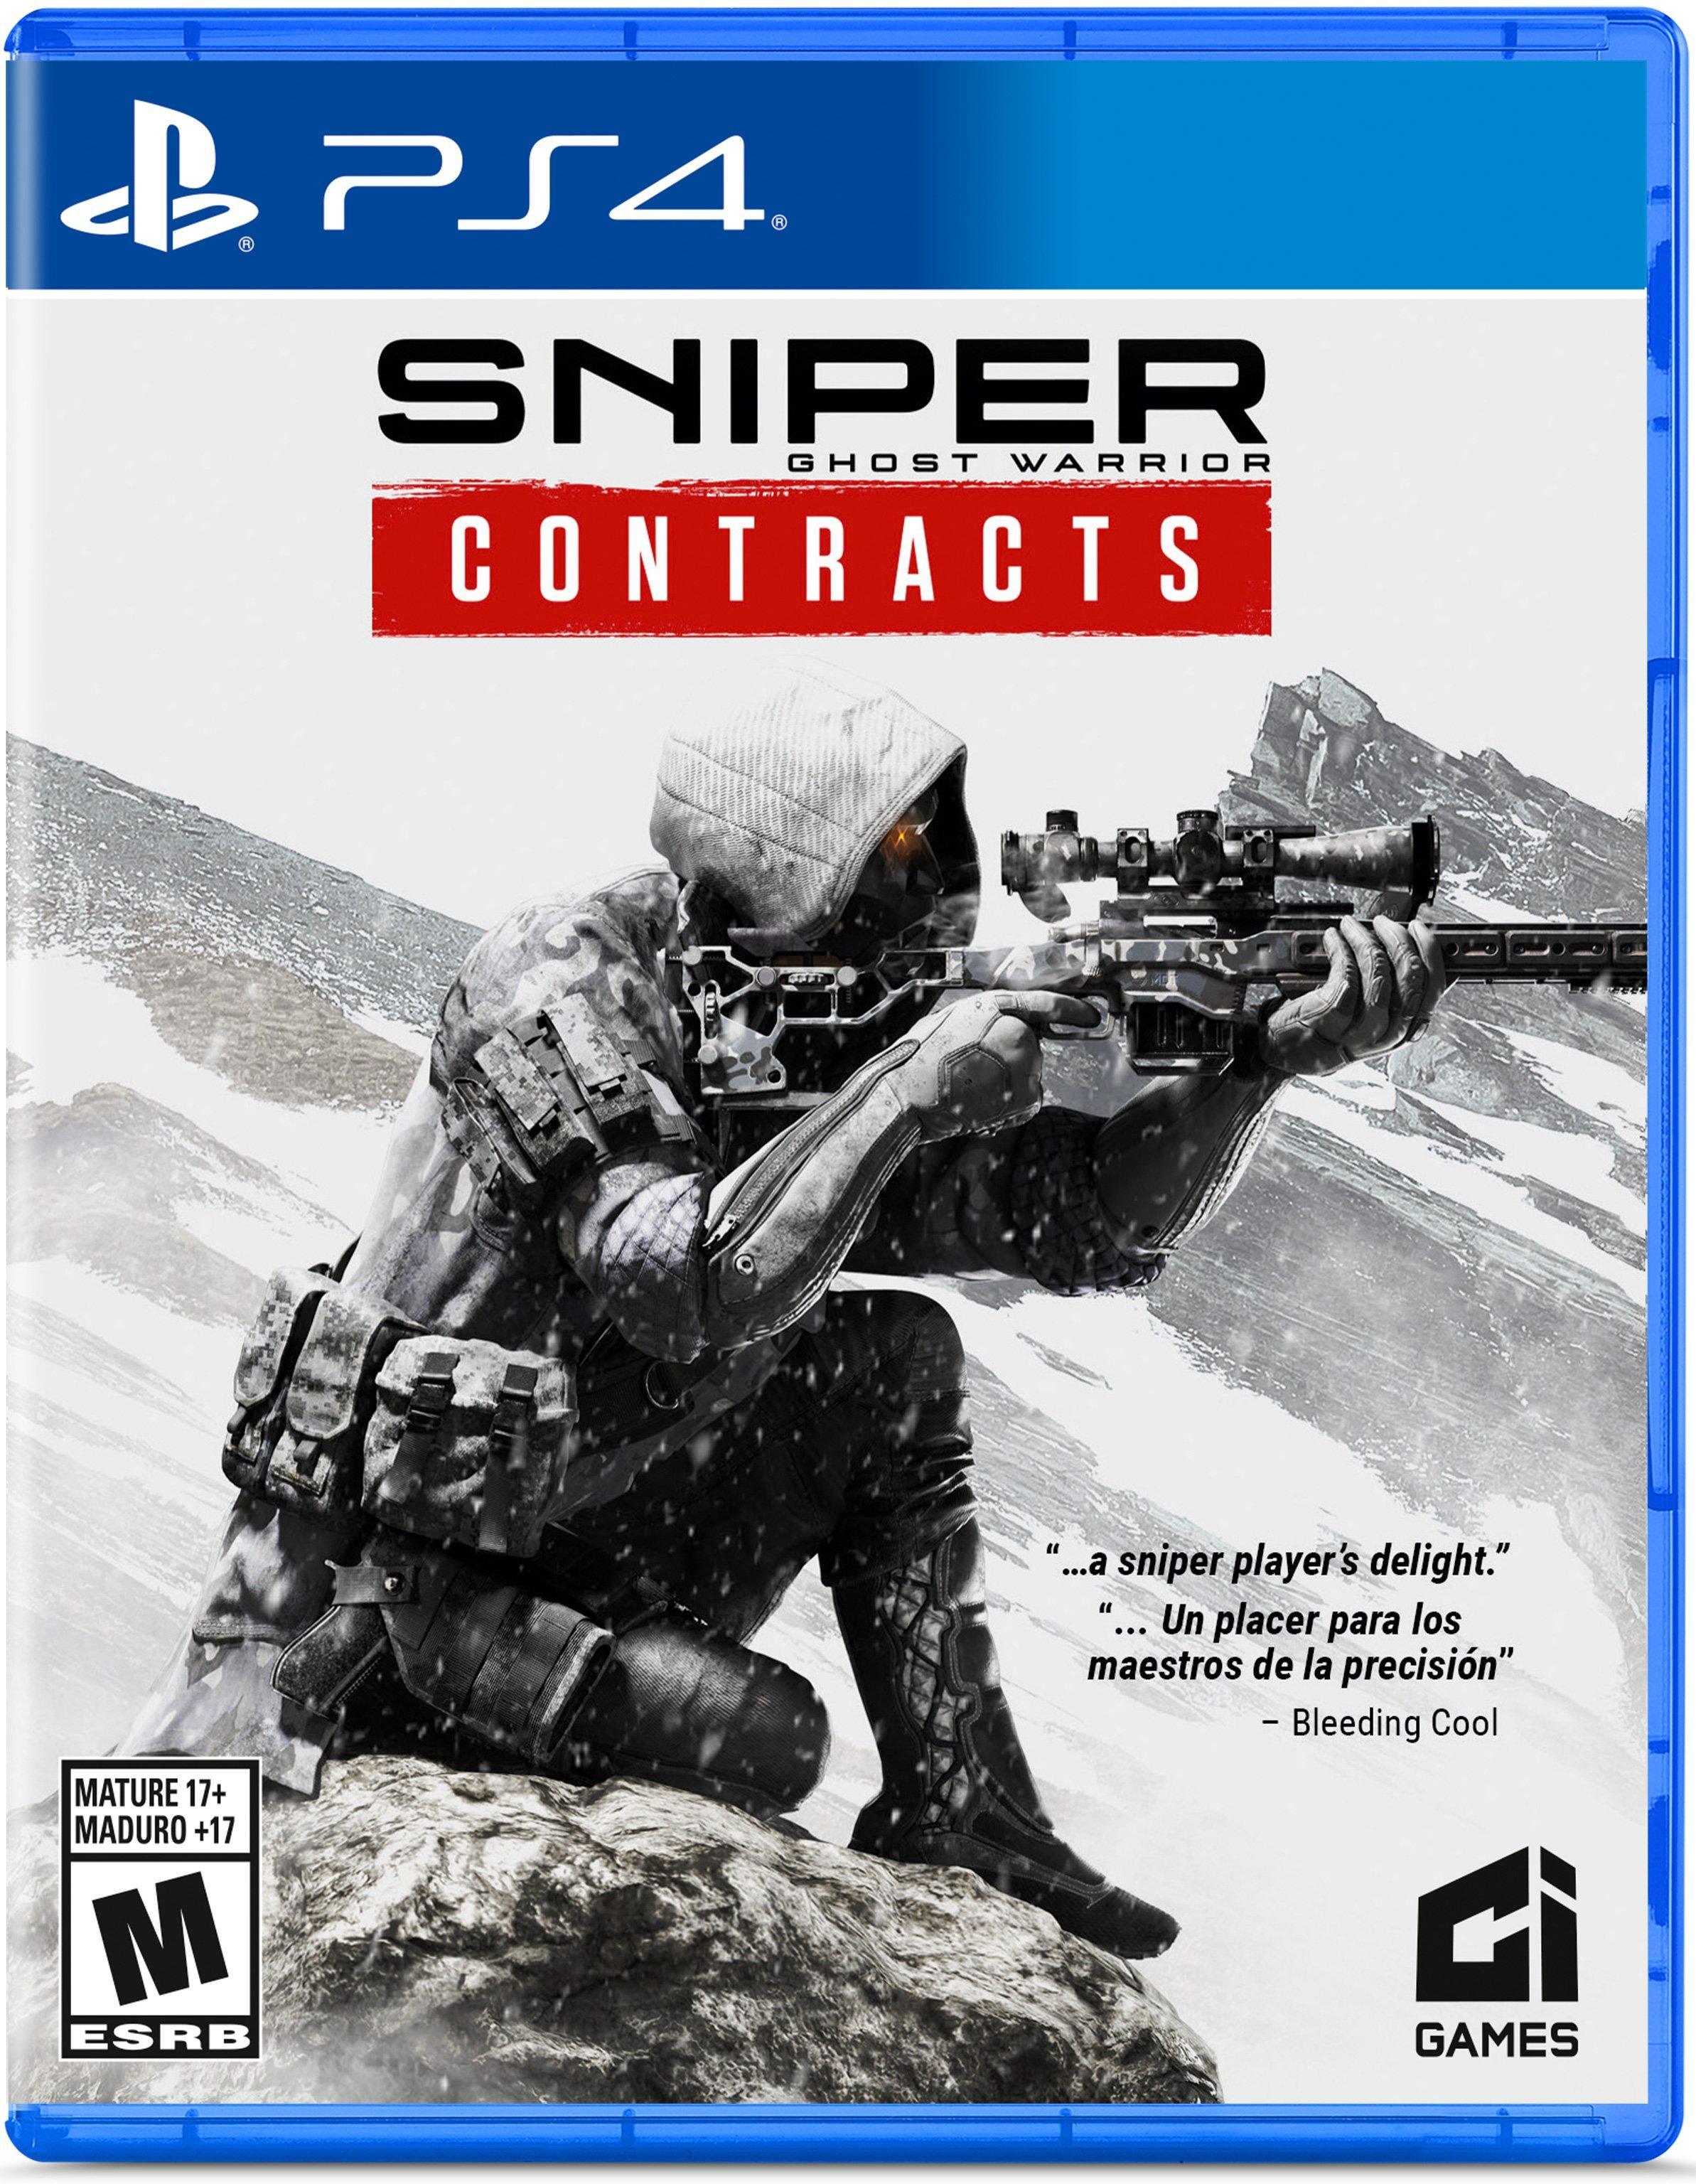 Sniper Ghost Warrior Contracts Playstation 4 Gamestop